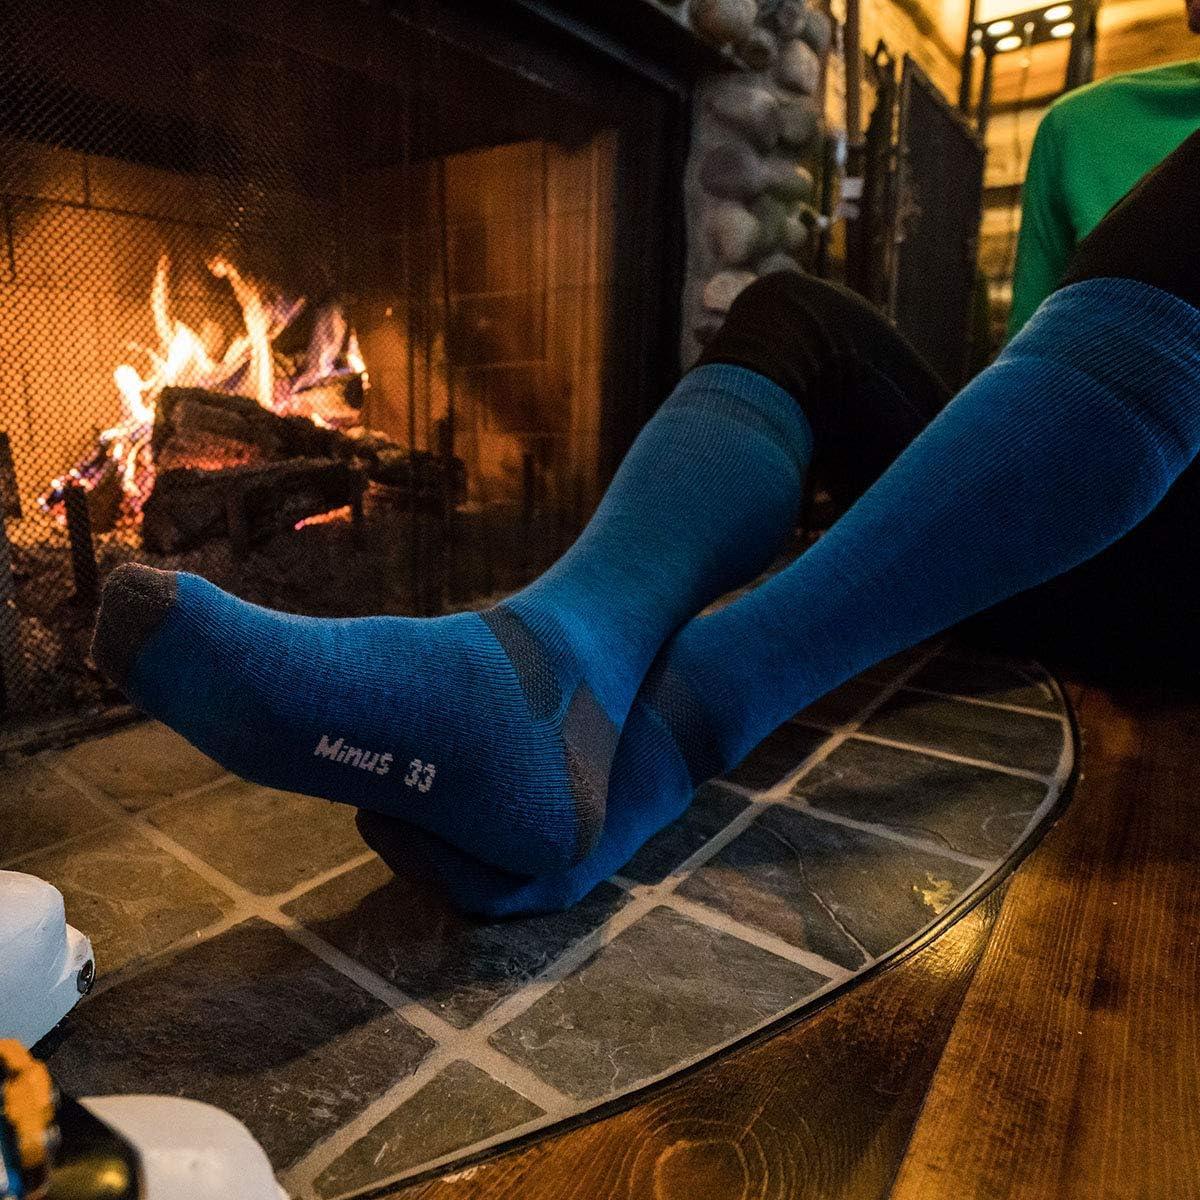 Minus33 Merino Wool Ski and Snowboard Sock